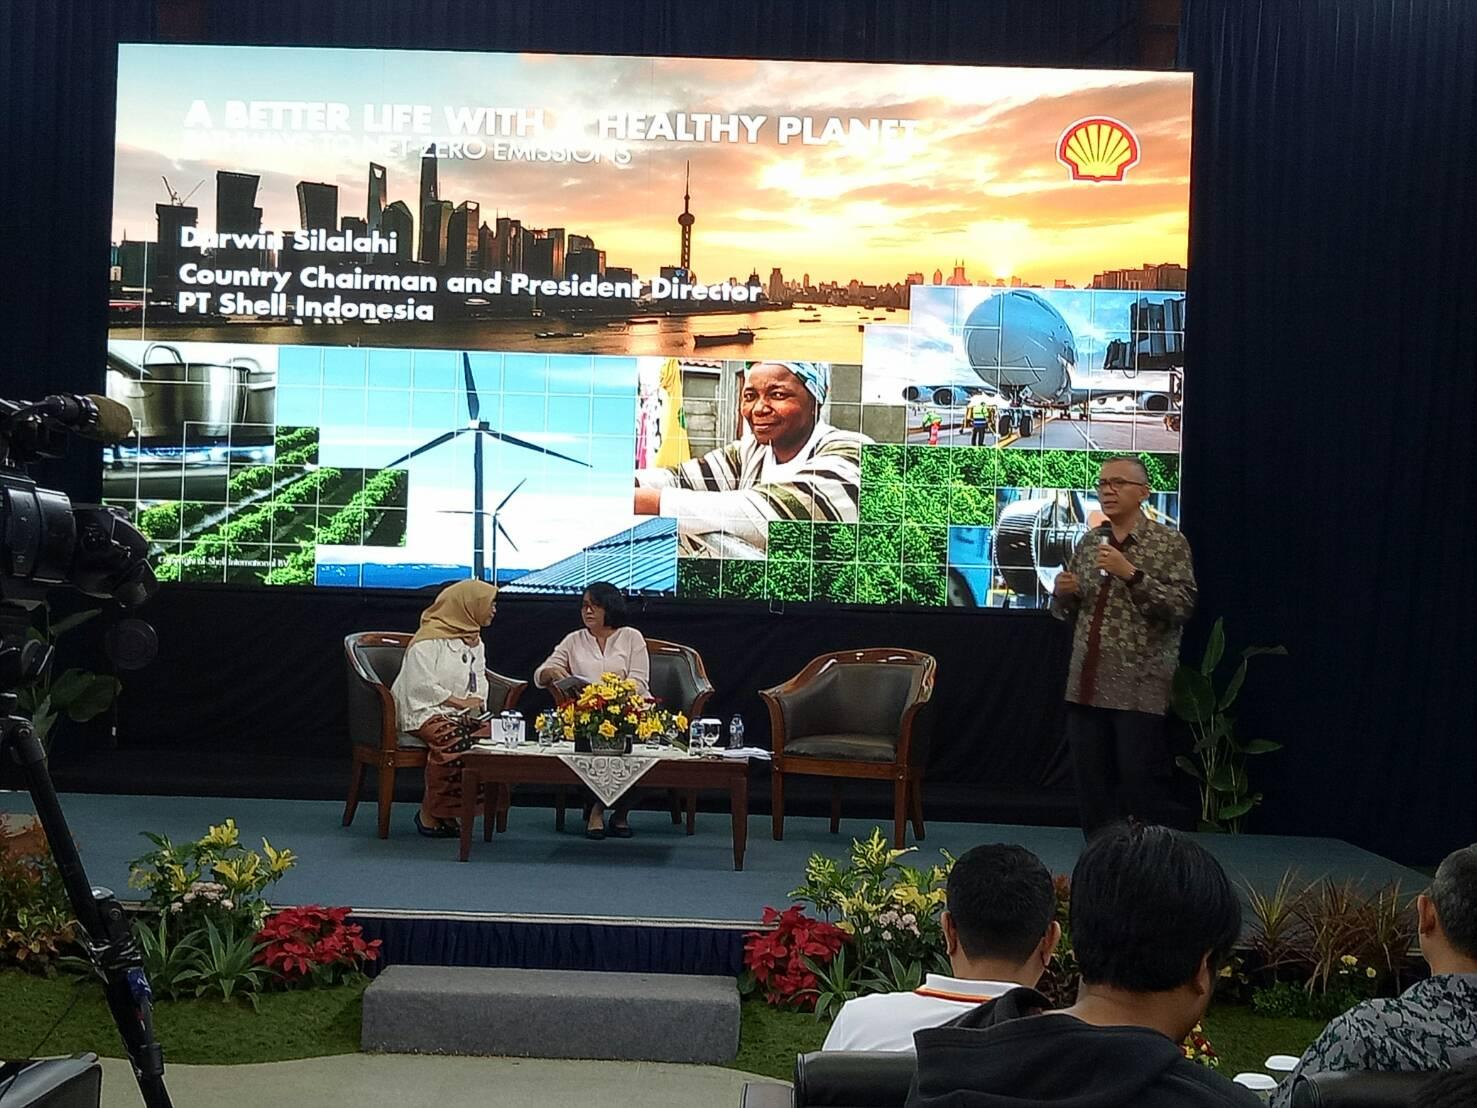 Presiden Shell Indonesia : Menuju Dunia Bebas Emisi Karbon